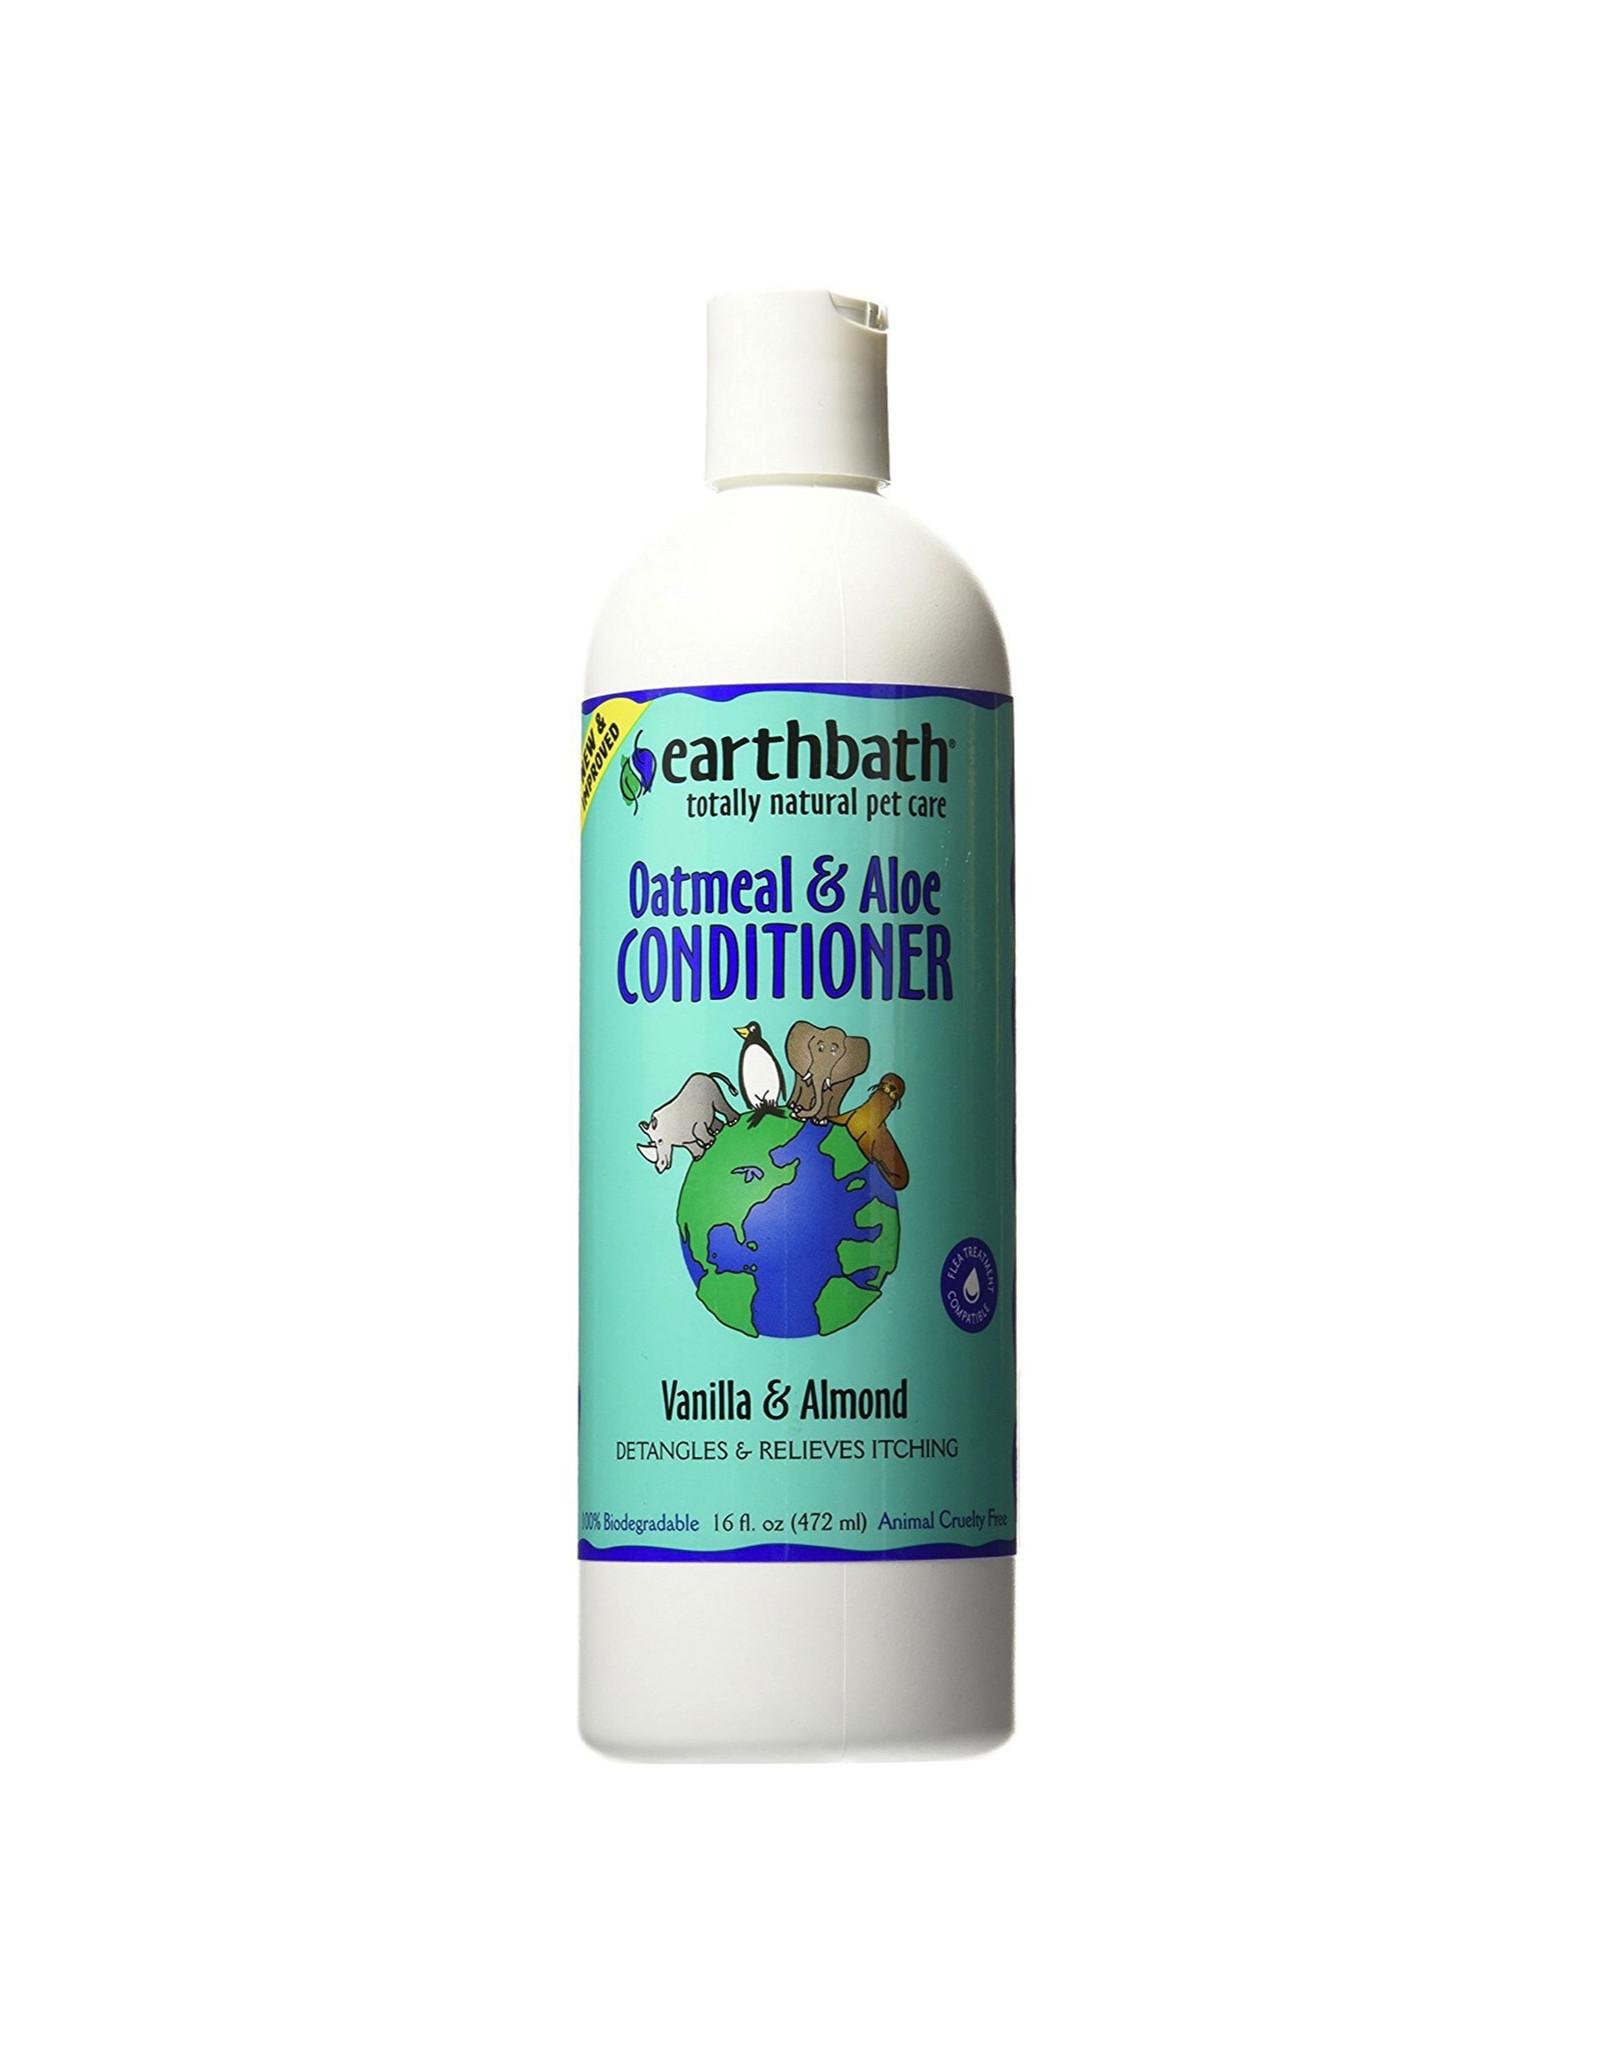 Earthbath Earthbath Oatmeal and Aloe Conditioner 16oz